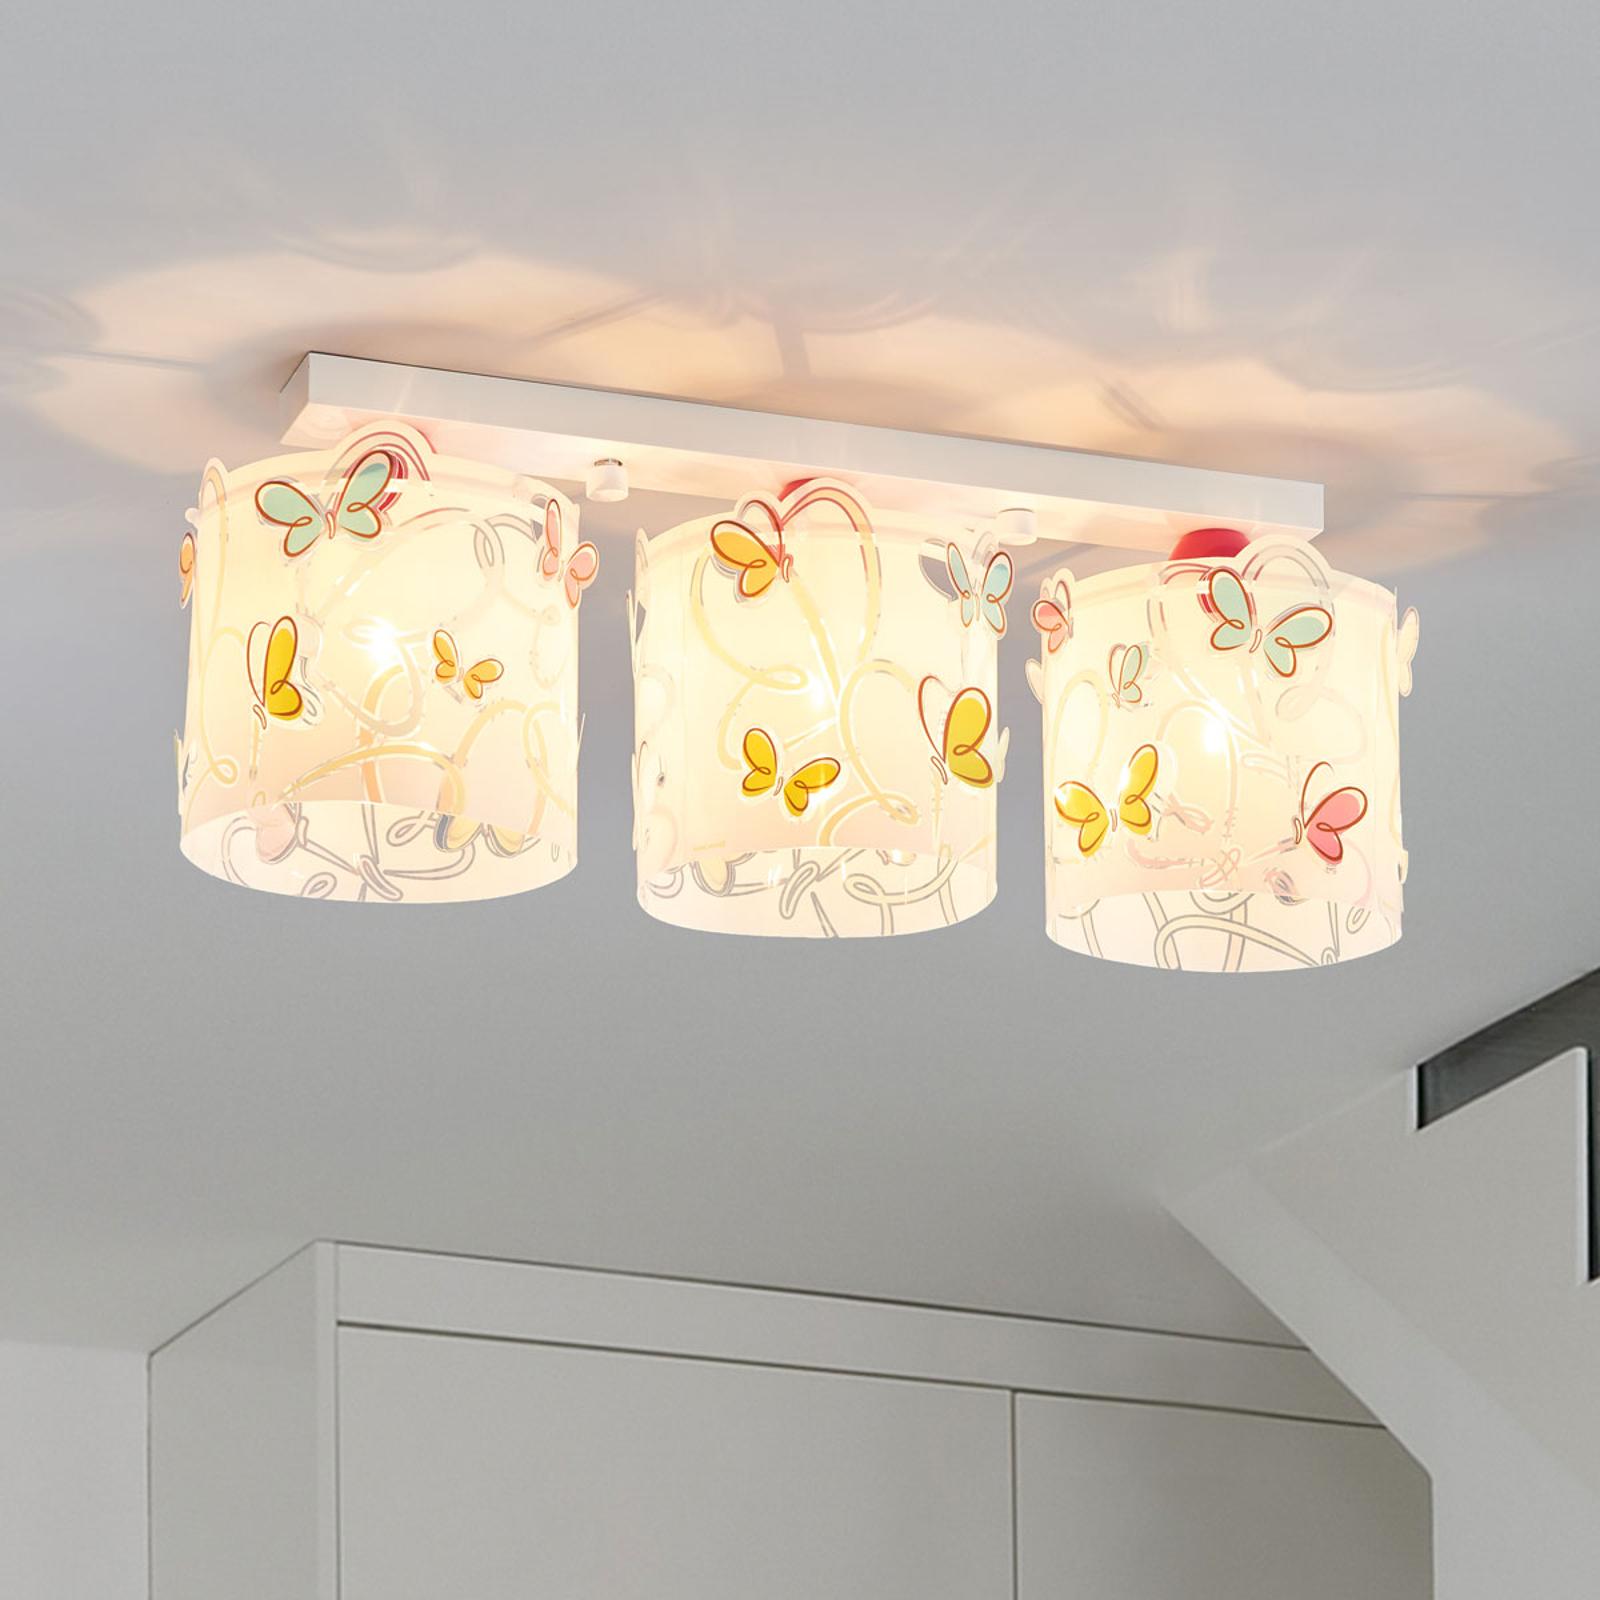 Acquista Plafoniera Butterfly per camere di bimbi